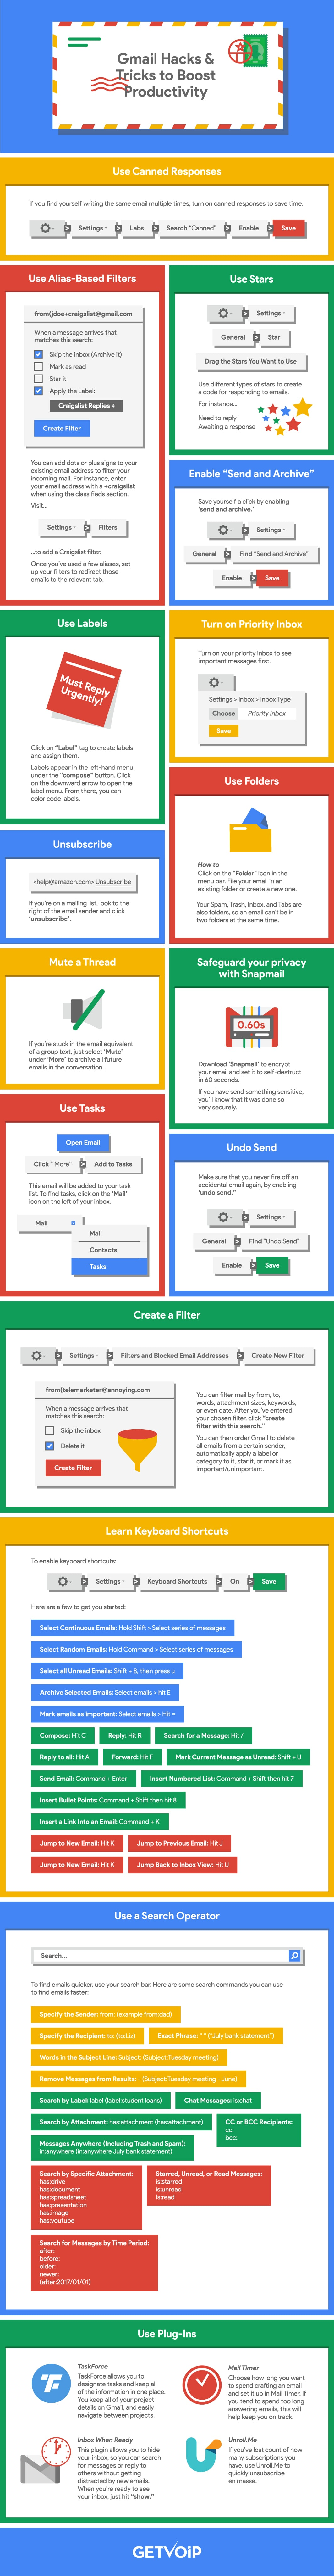 Gmail hacks, gmail tips